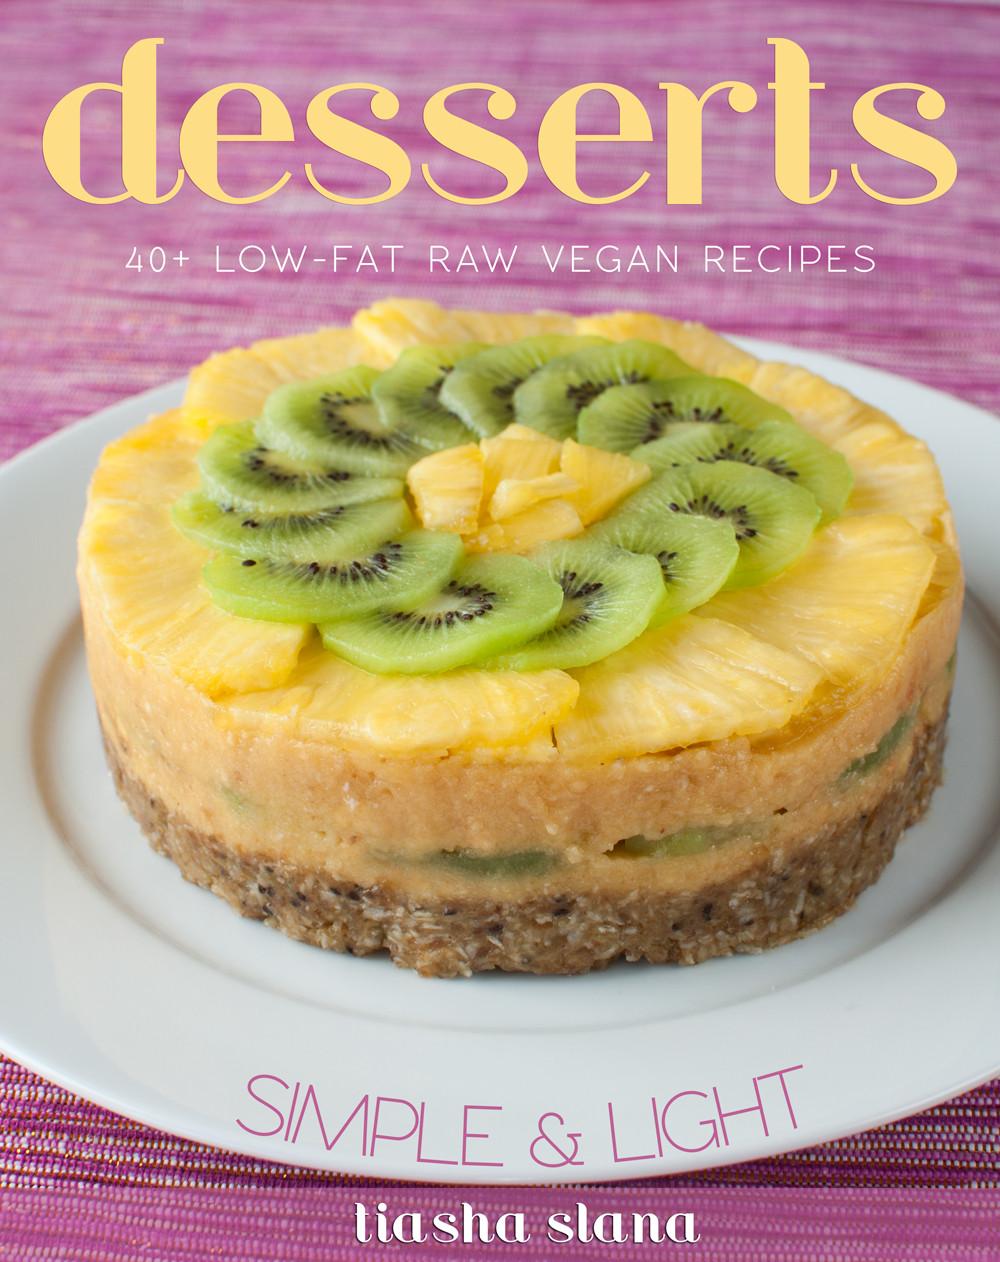 Low Fat Vegan Recipes  SIMPLE & LIGHT DESSERTS 40 low fat raw vegan recipes